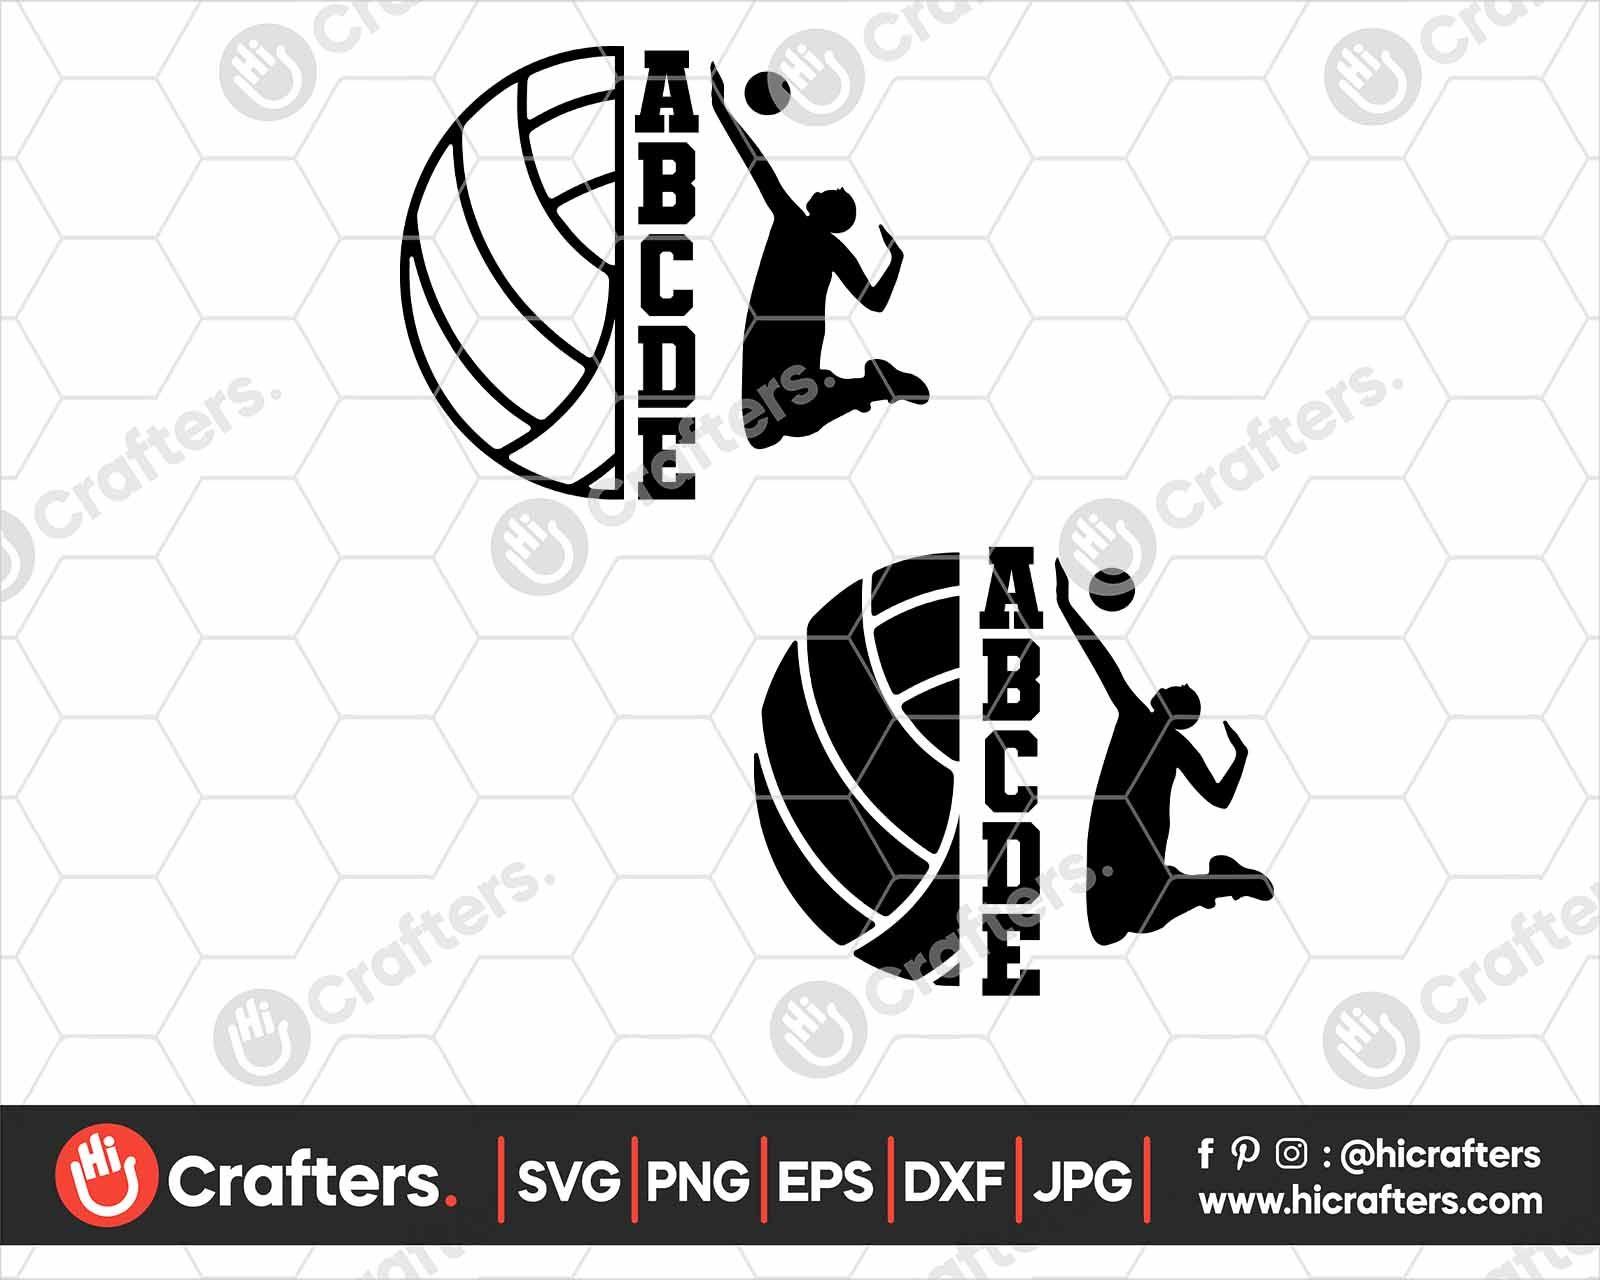 Split Volleyball Svg Volleyball Svg Design Hi Crafters In 2020 Svg Design Svg Design